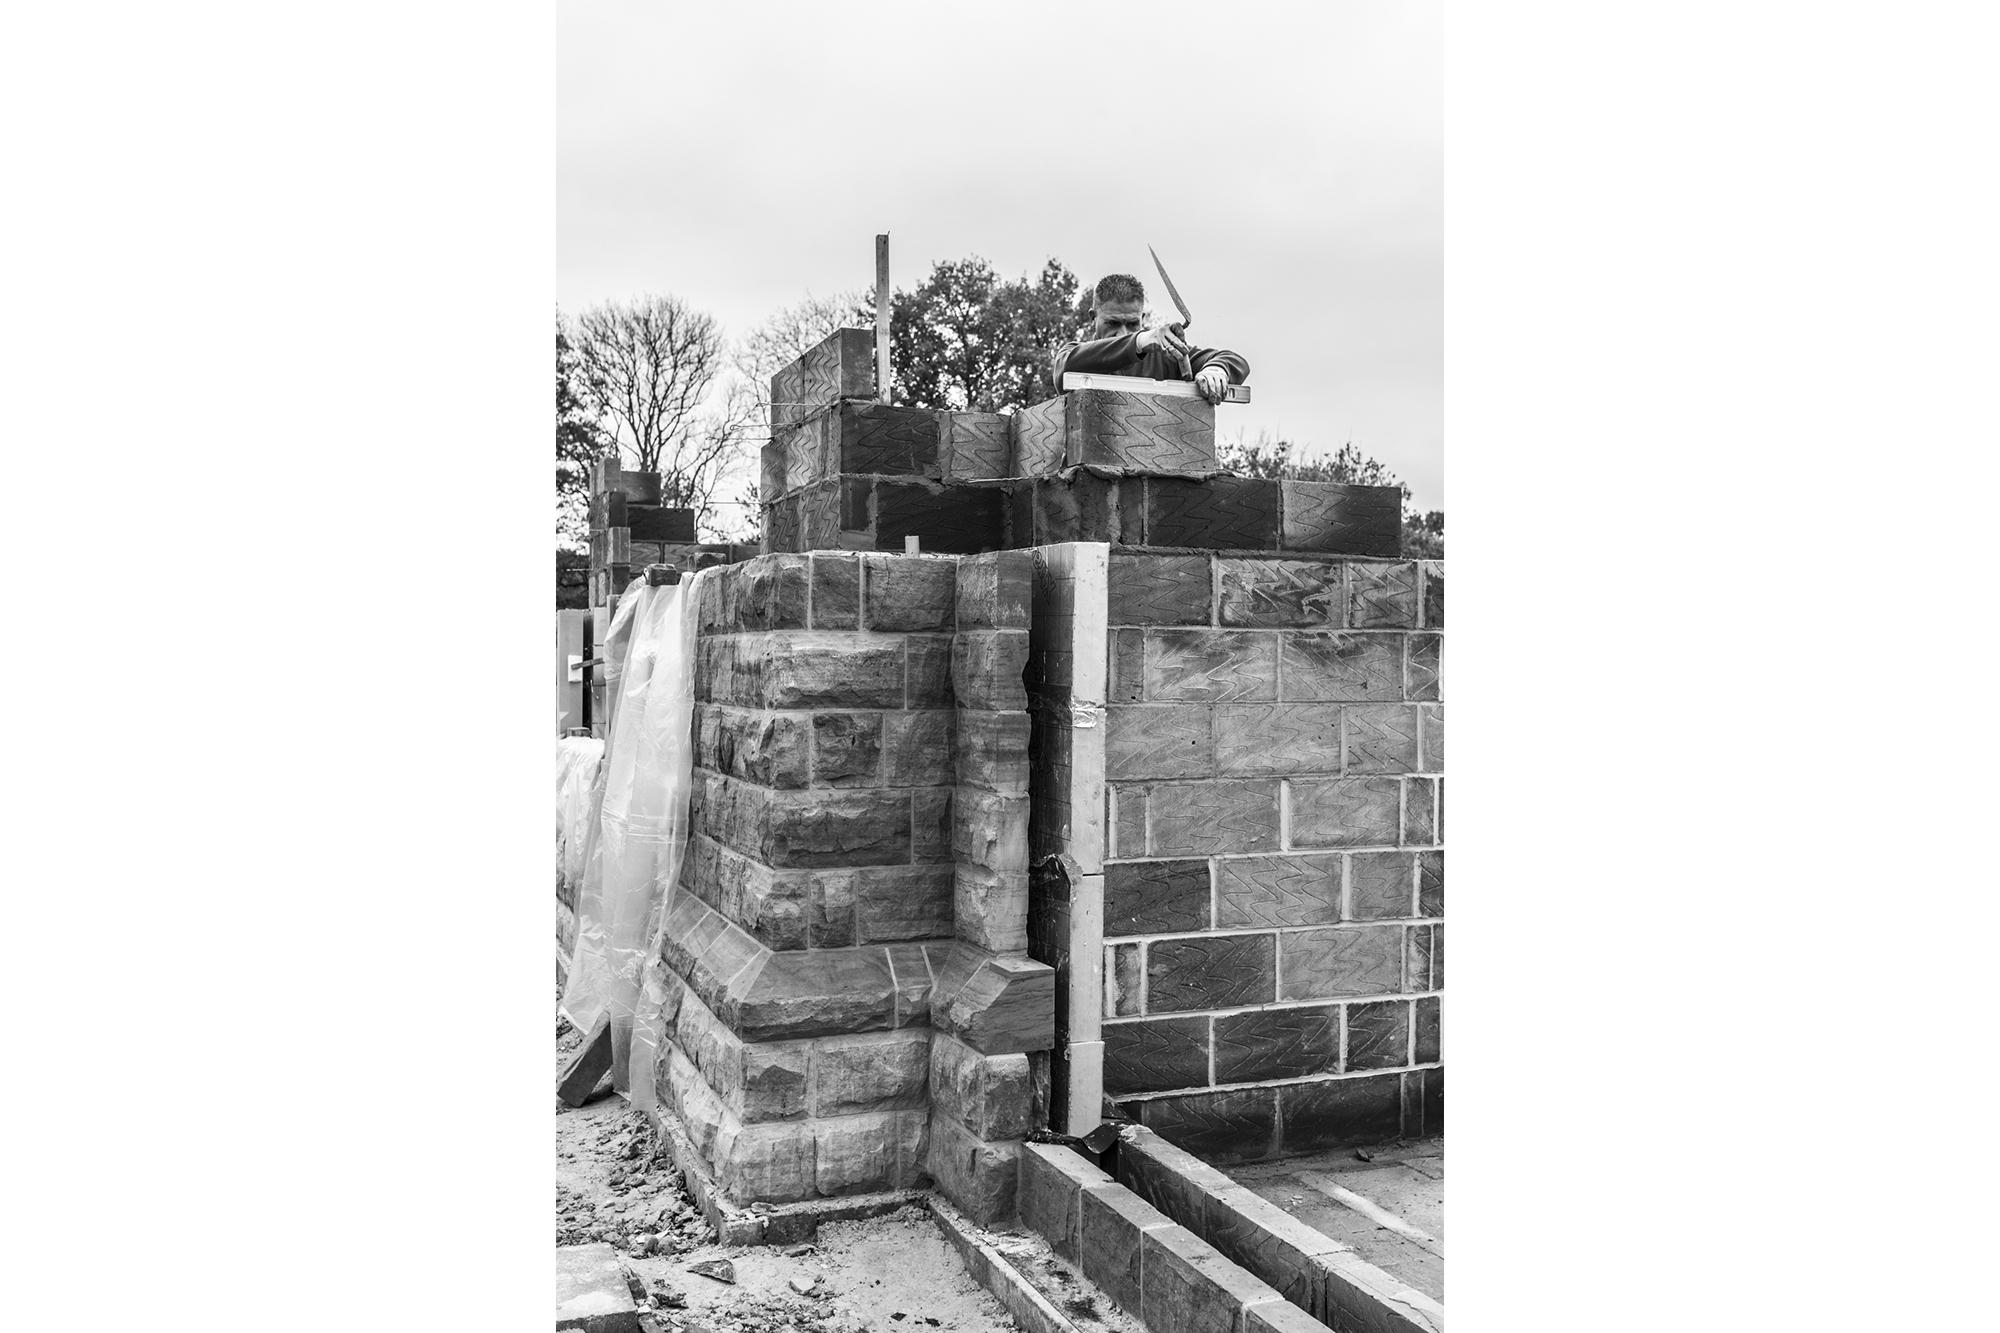 Homefields_Construction_43.jpg